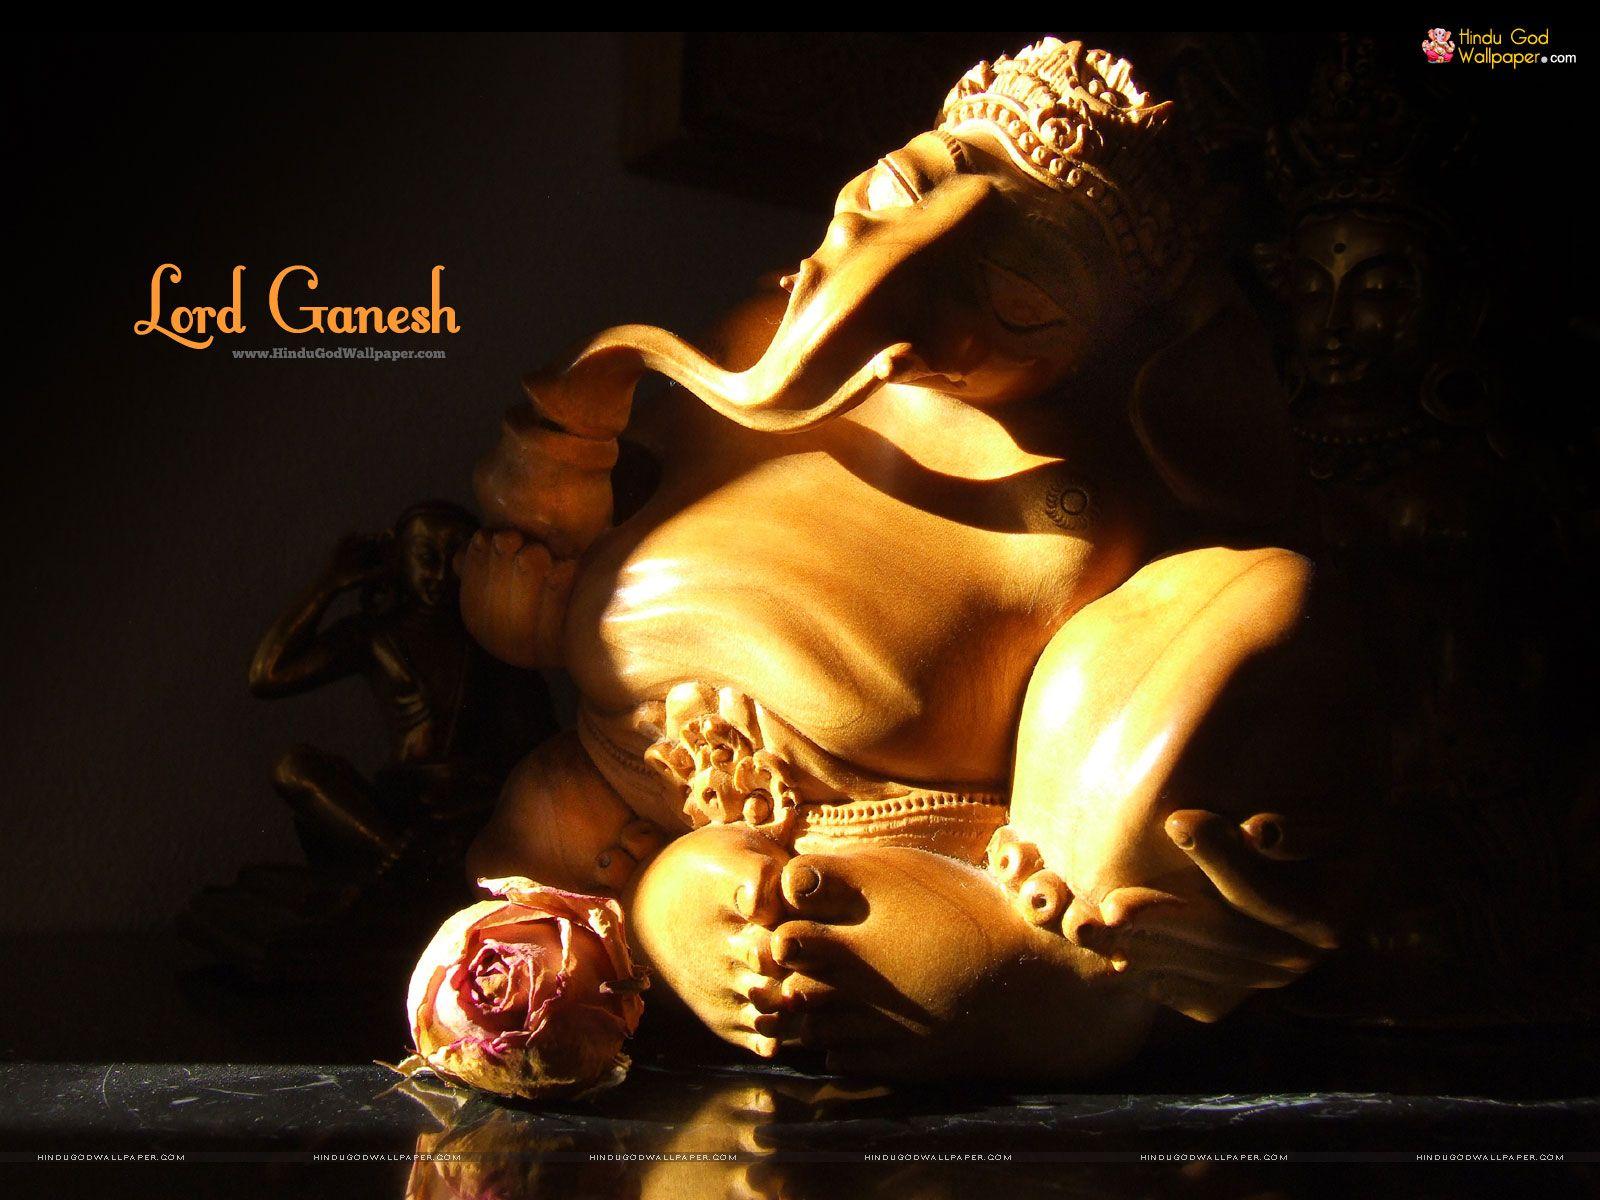 Wallpaper download ganesh - Lord Ganesha Hd Wallpapers Free Download